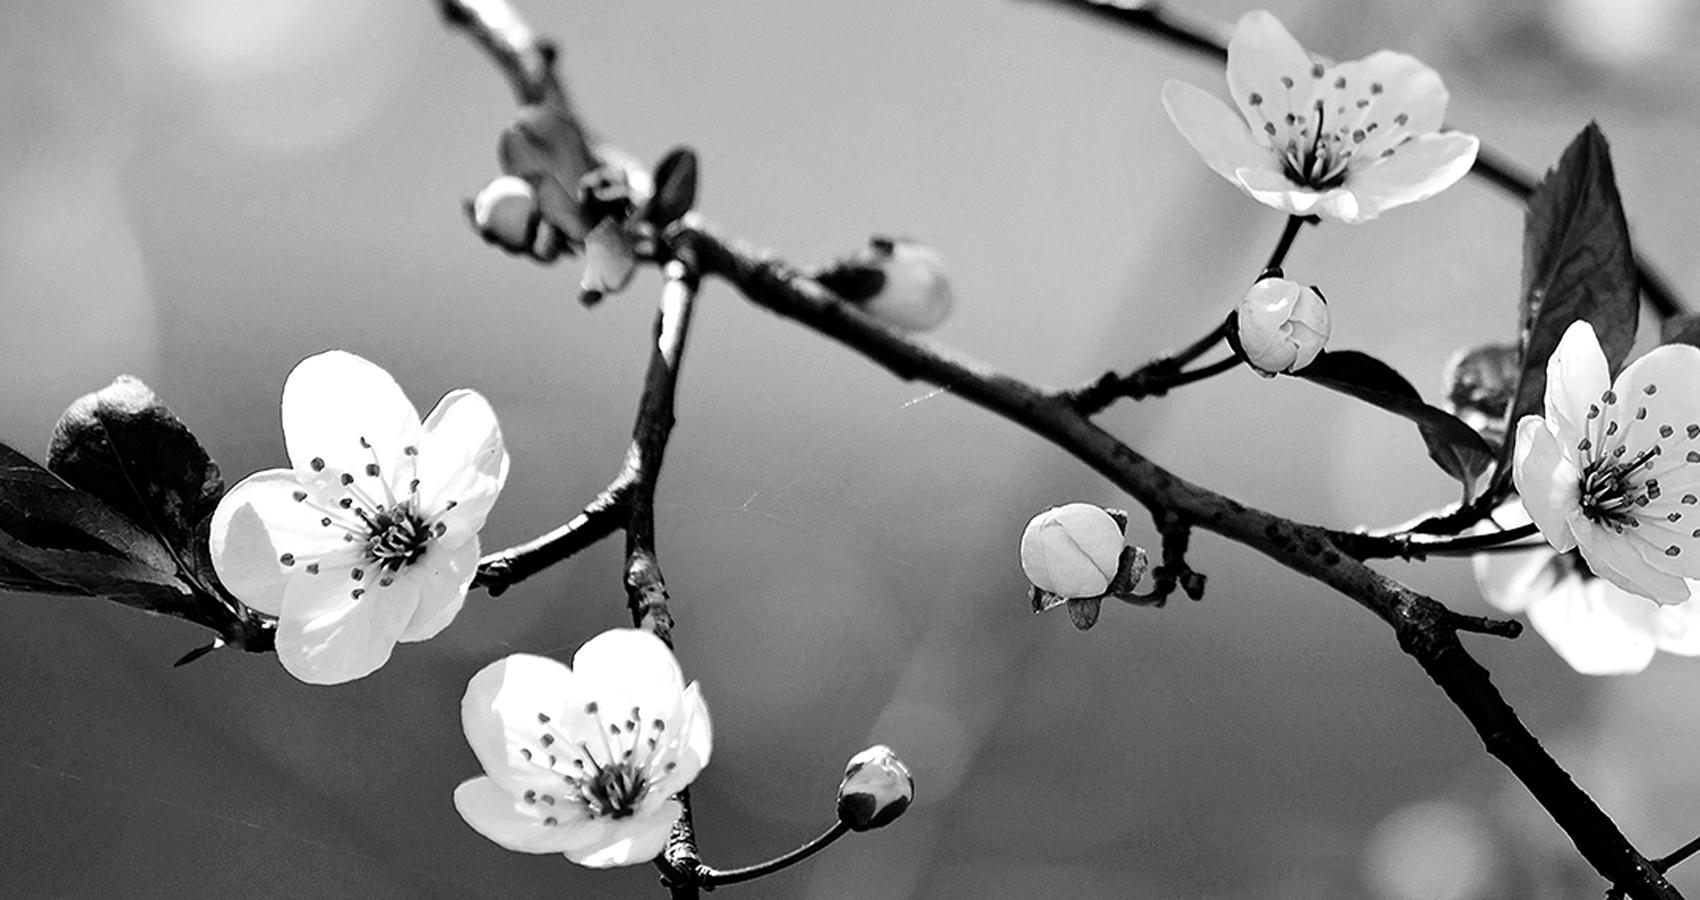 Blossom Day by Sarra7*( (Dr.StrangeLove) at Spillwords.com